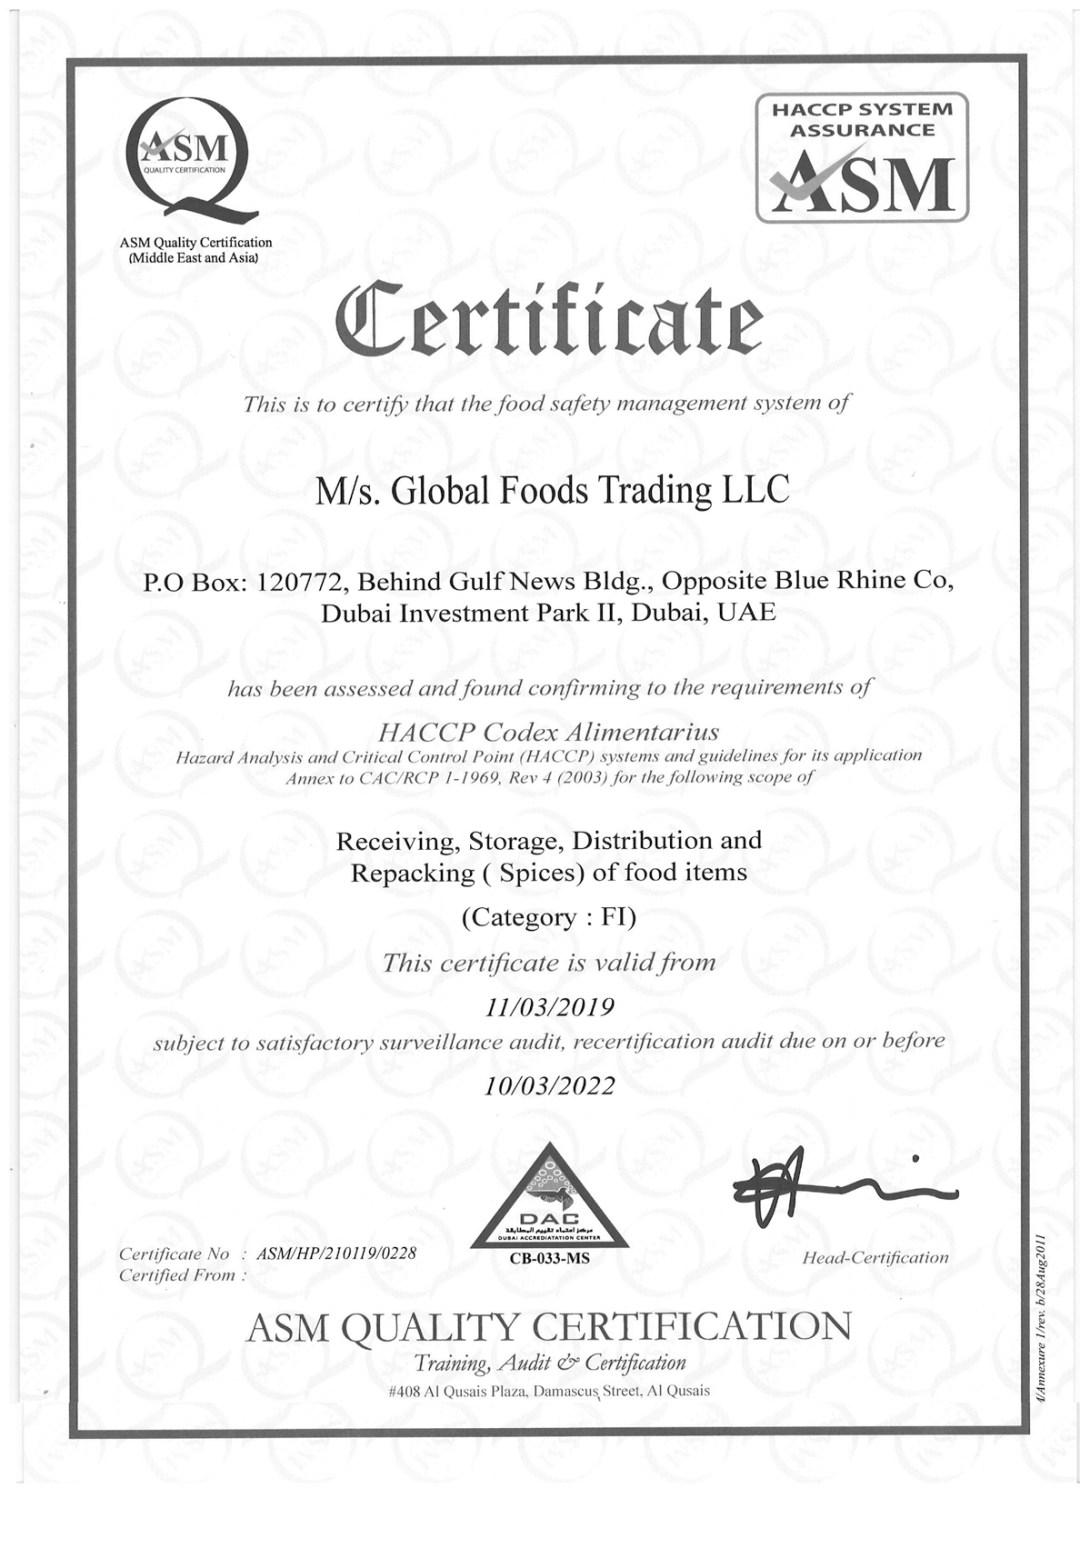 HACCPGF Certification